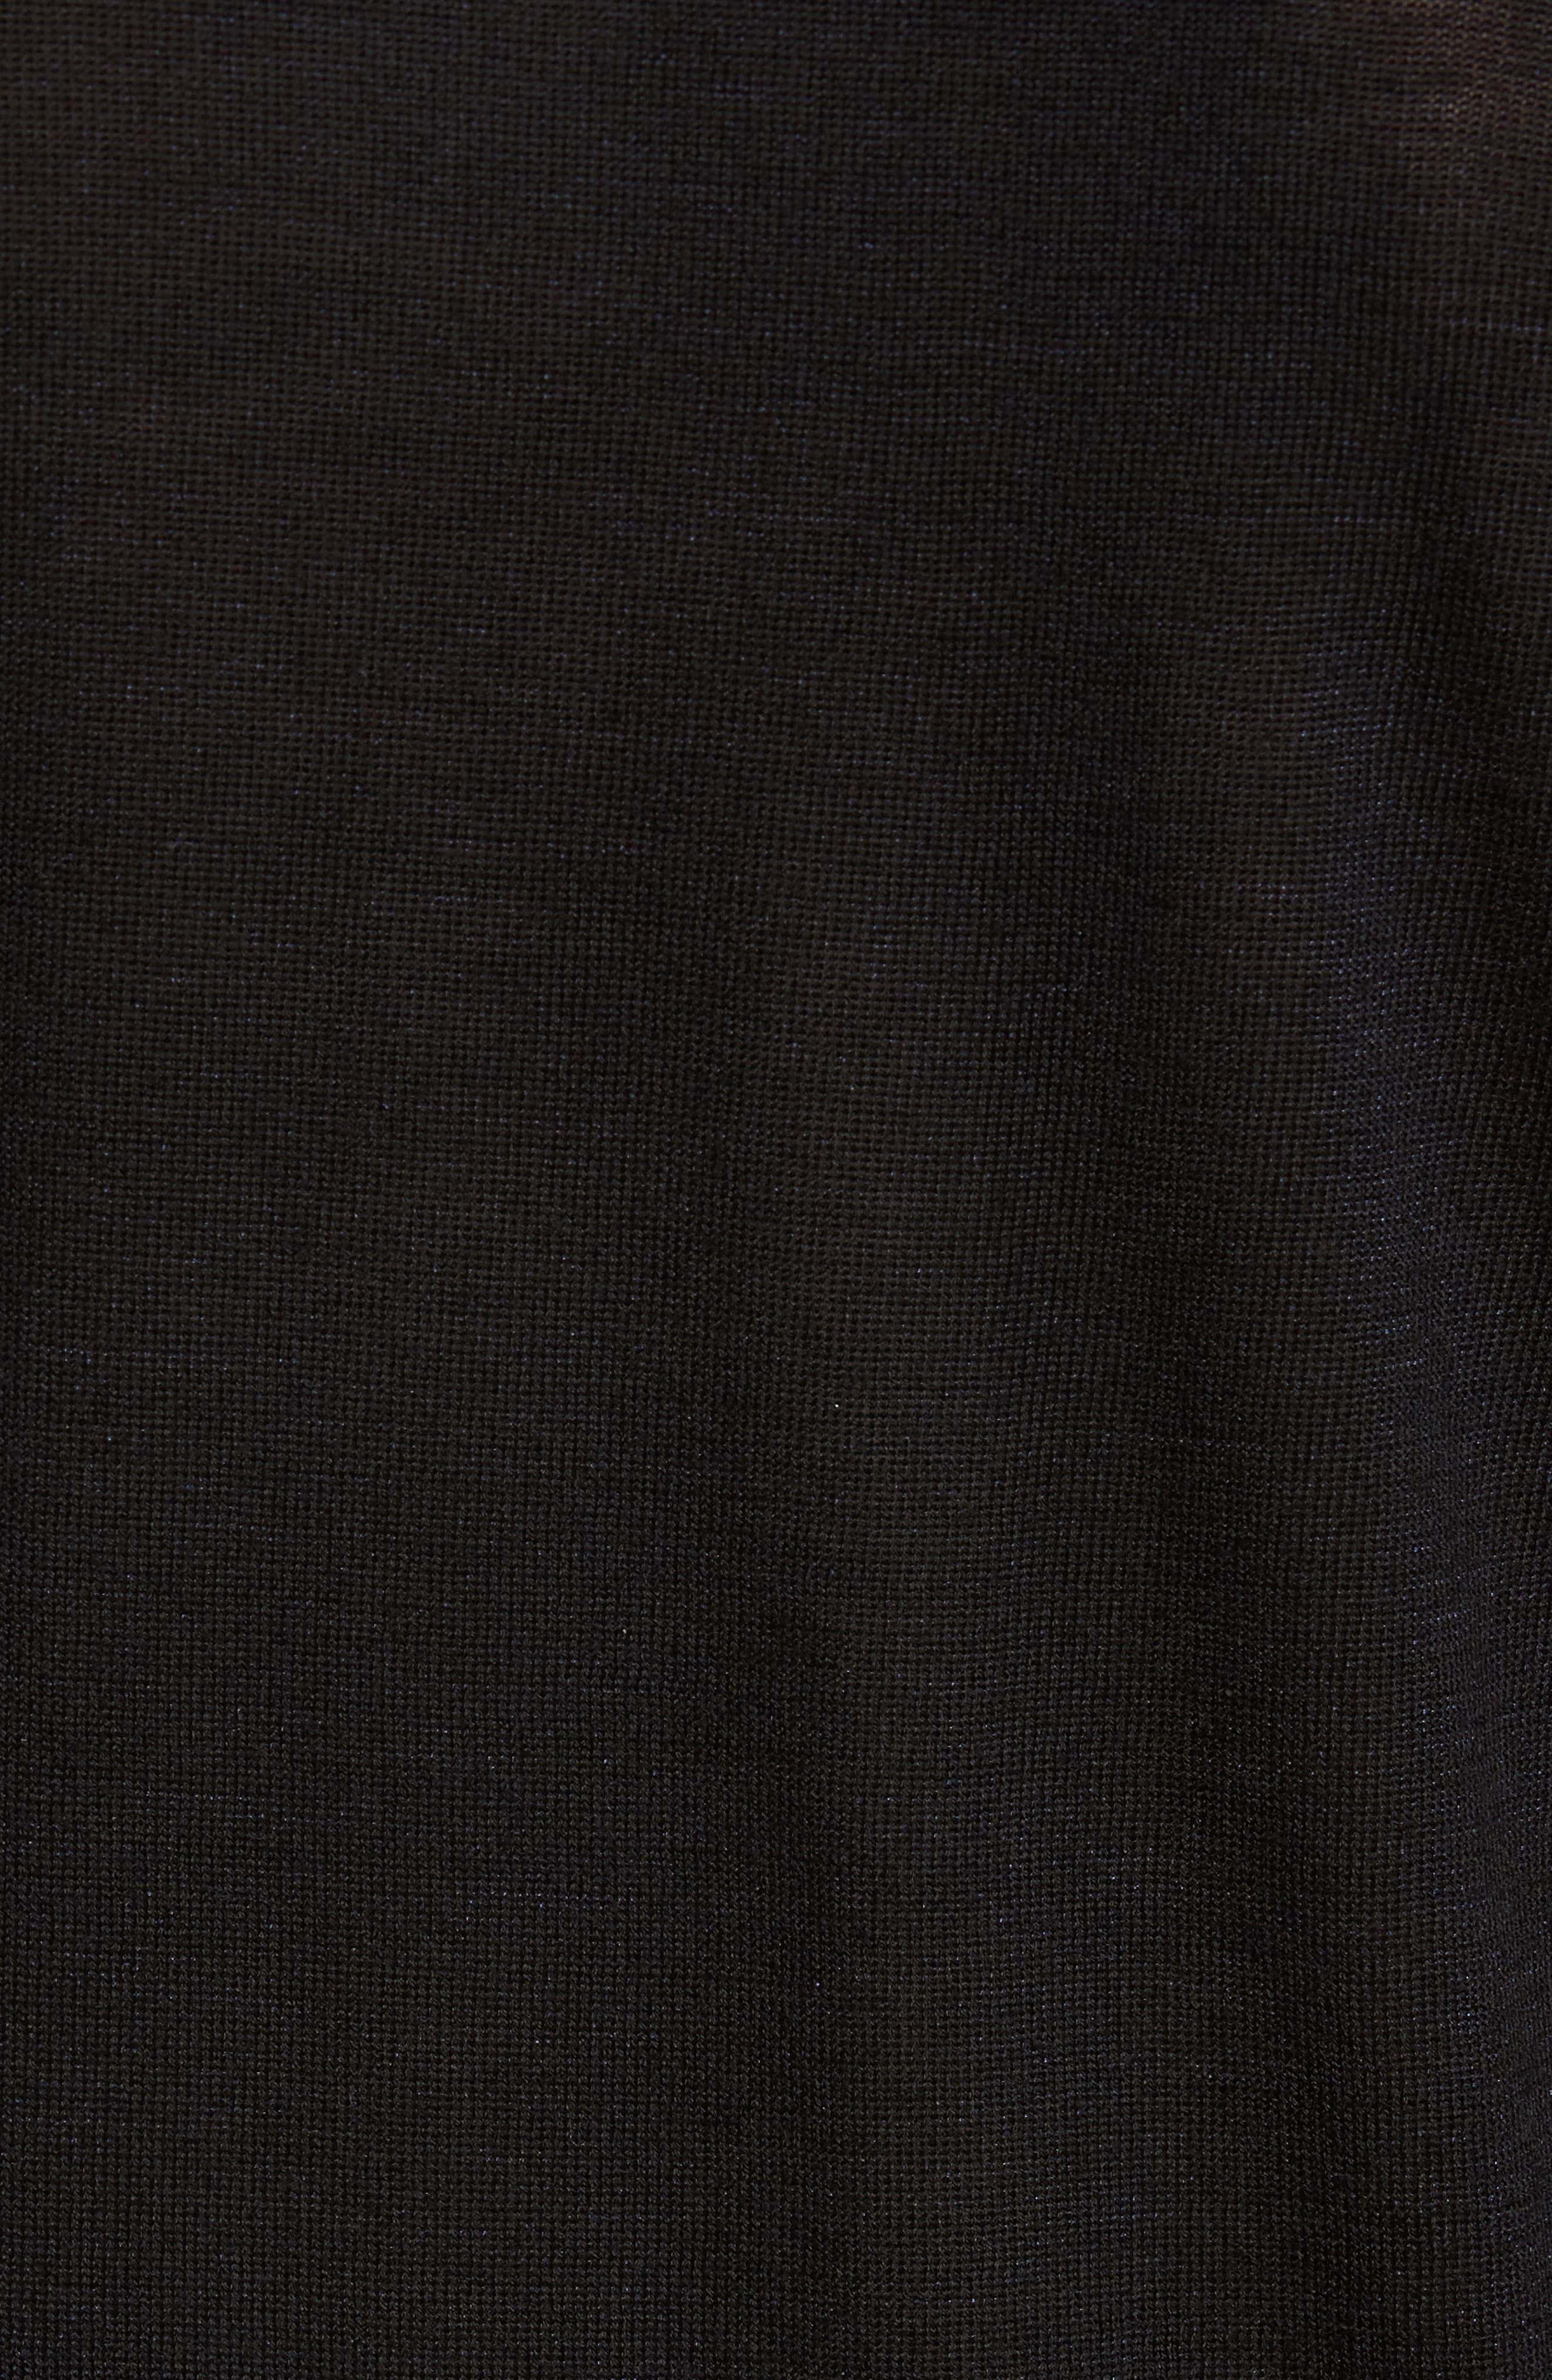 Crewneck Wool Blend Sweater,                             Alternate thumbnail 5, color,                             Black